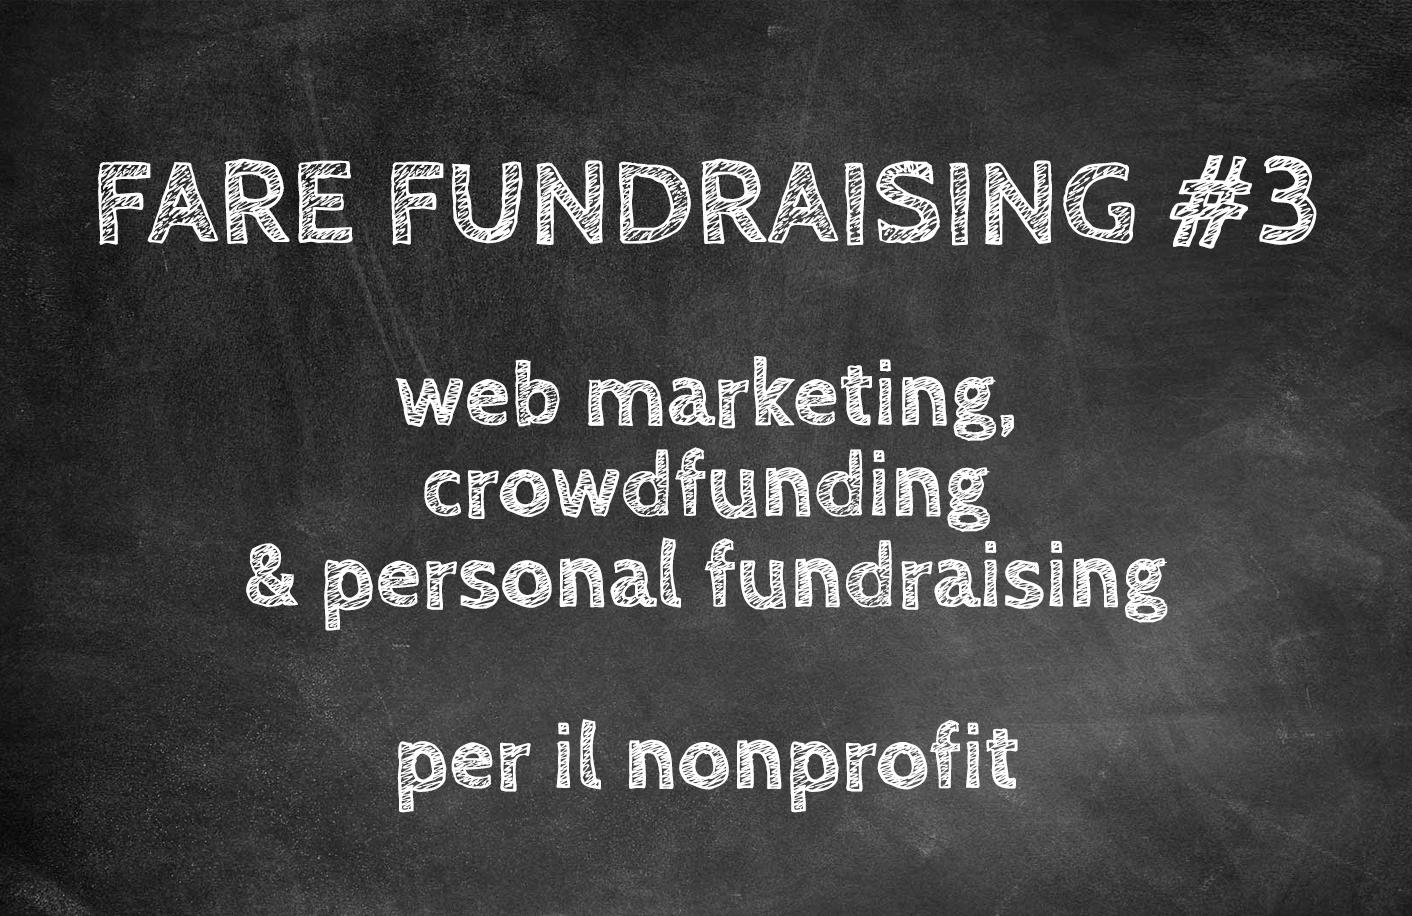 FARE FUNDRAISING #3: web marketing & crowdfunding